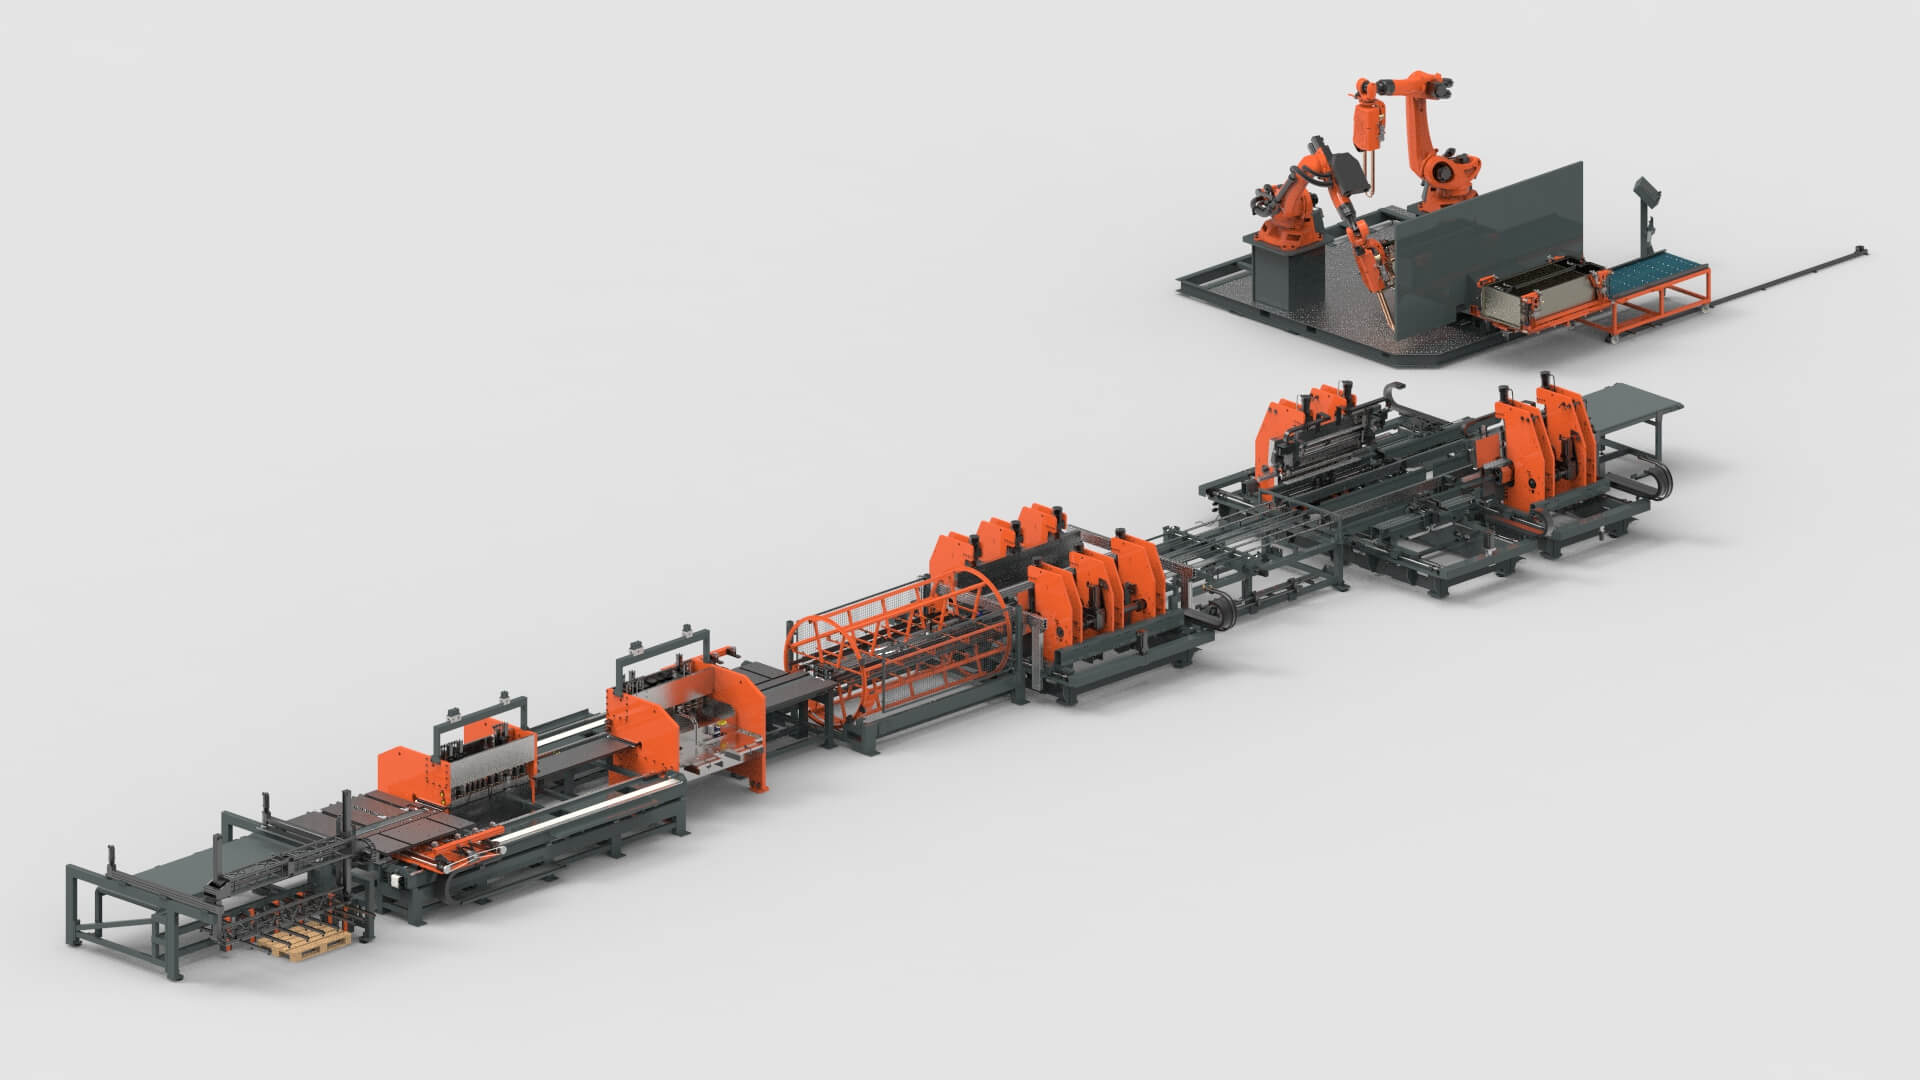 wemo-steel-cabinets-sheet-metal-punching-bending-robotic-welding-production-line.jpg